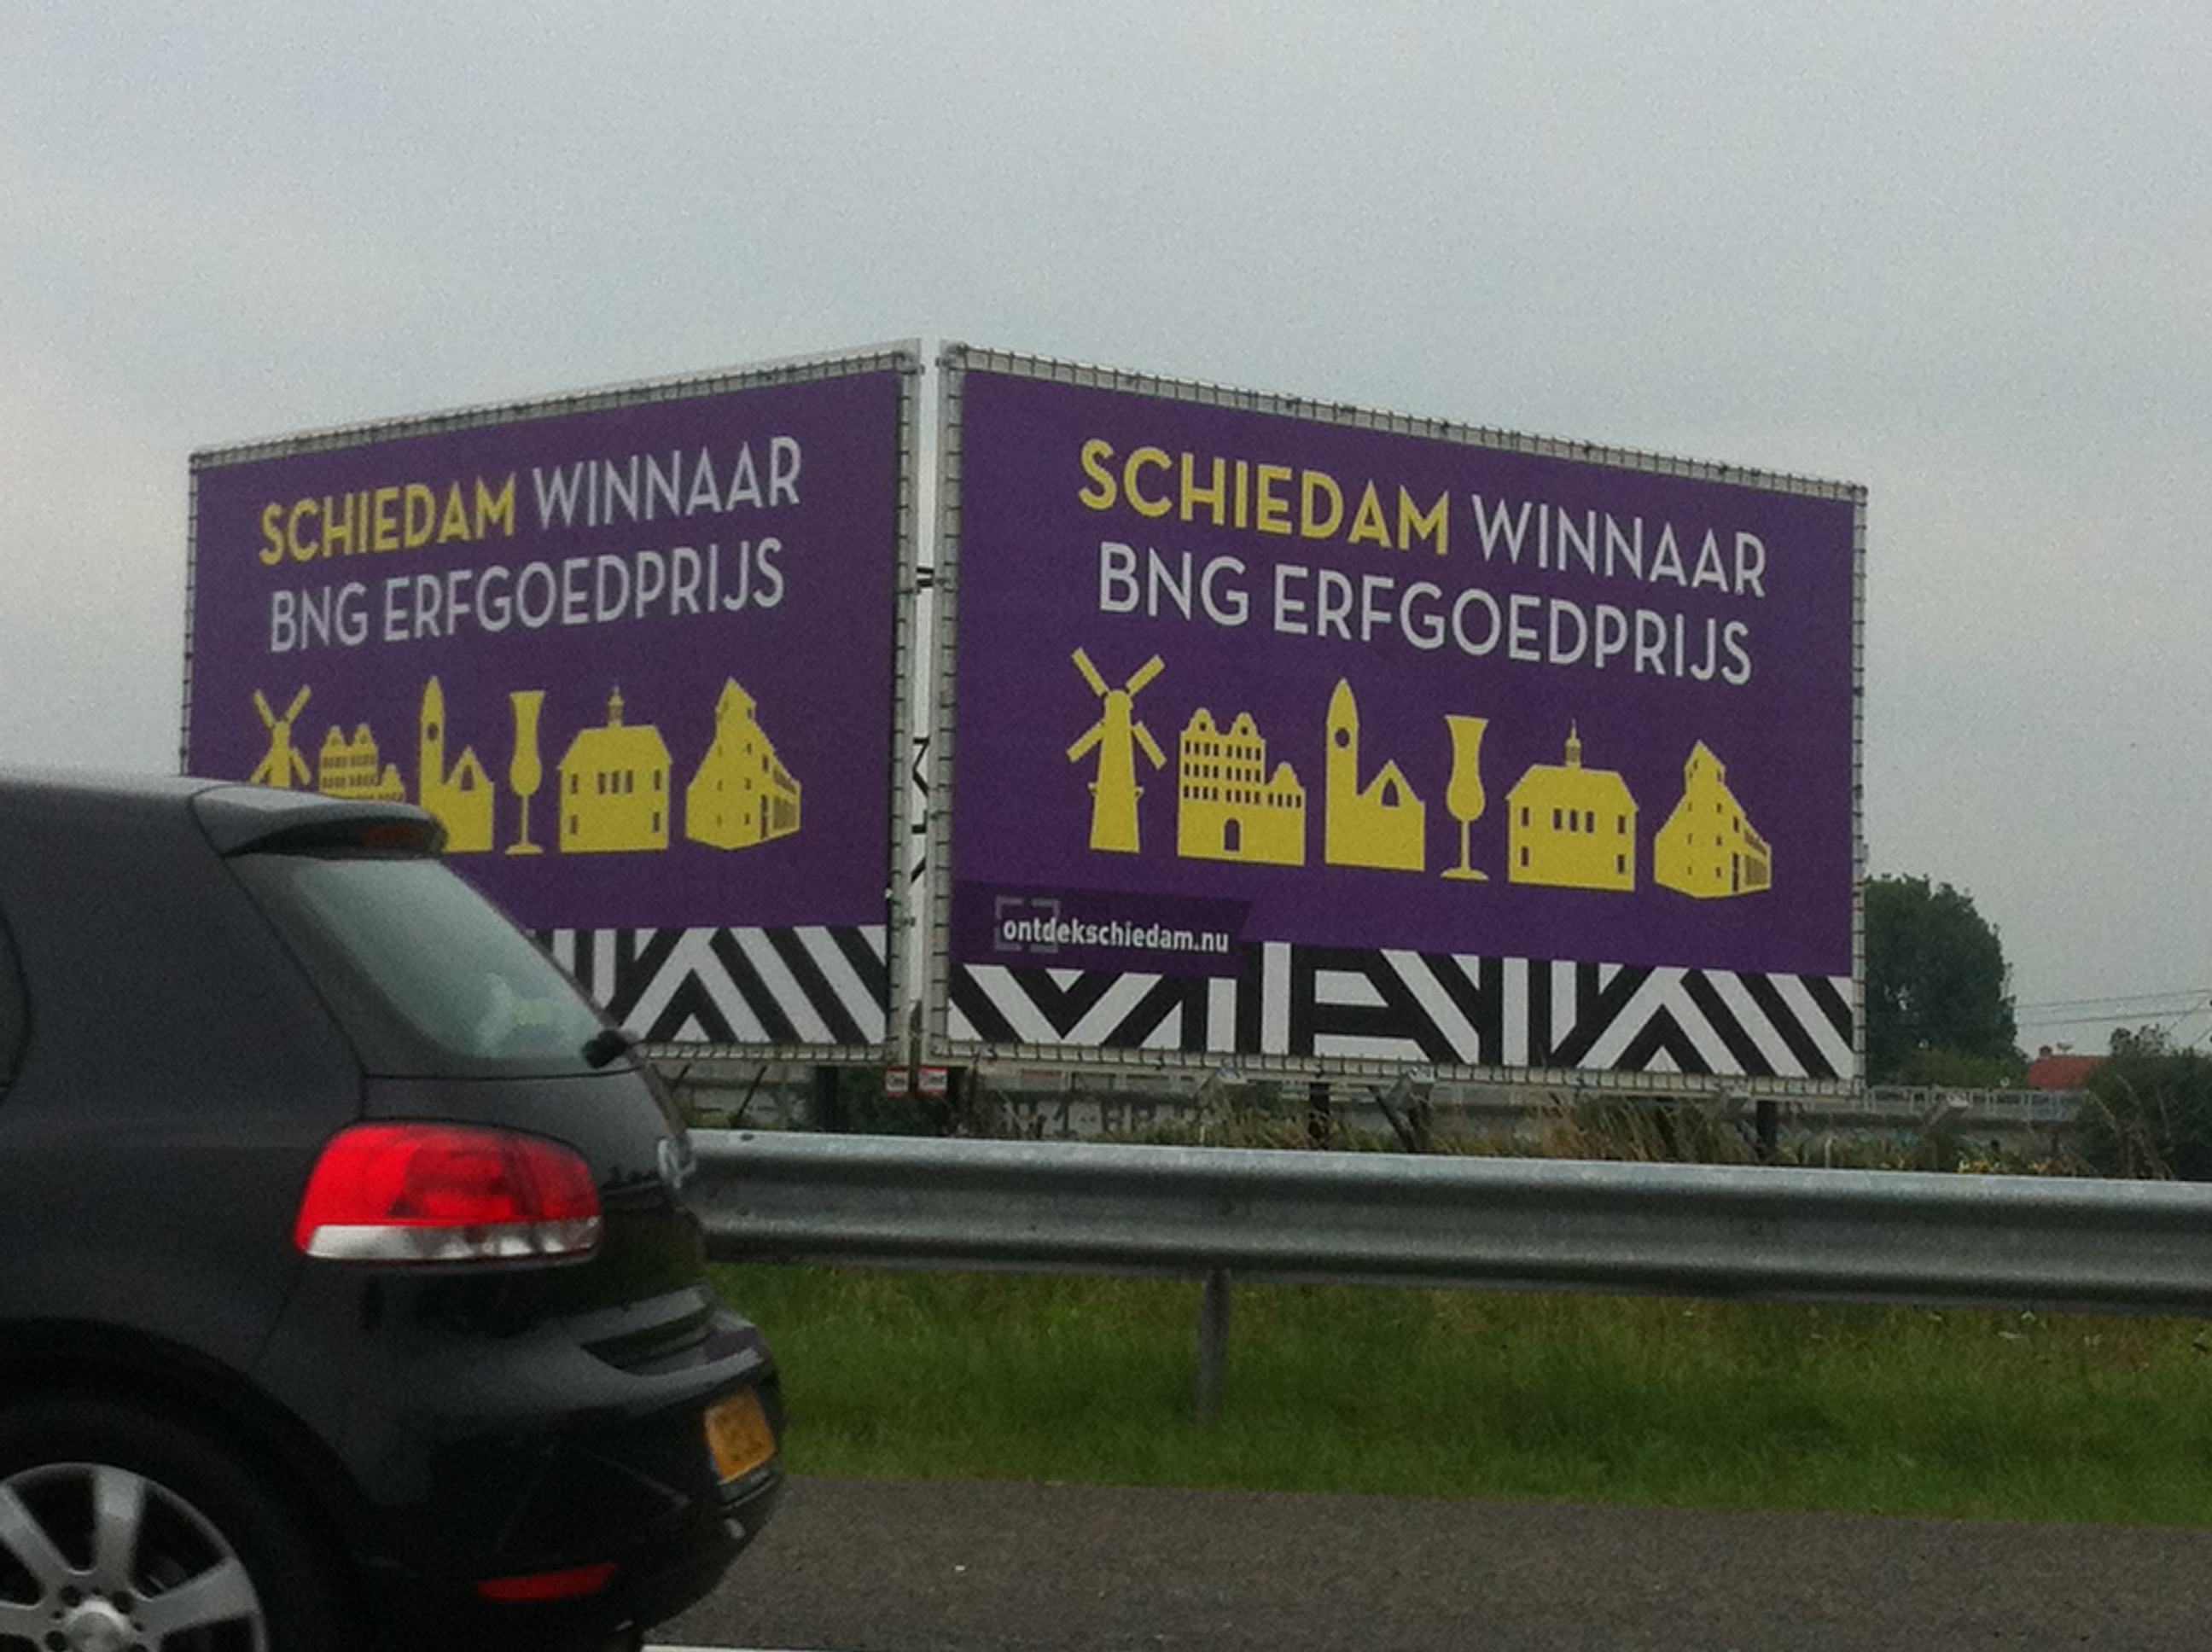 BNG Erfgoedprijs Schiedam snelweg A4 winnaar